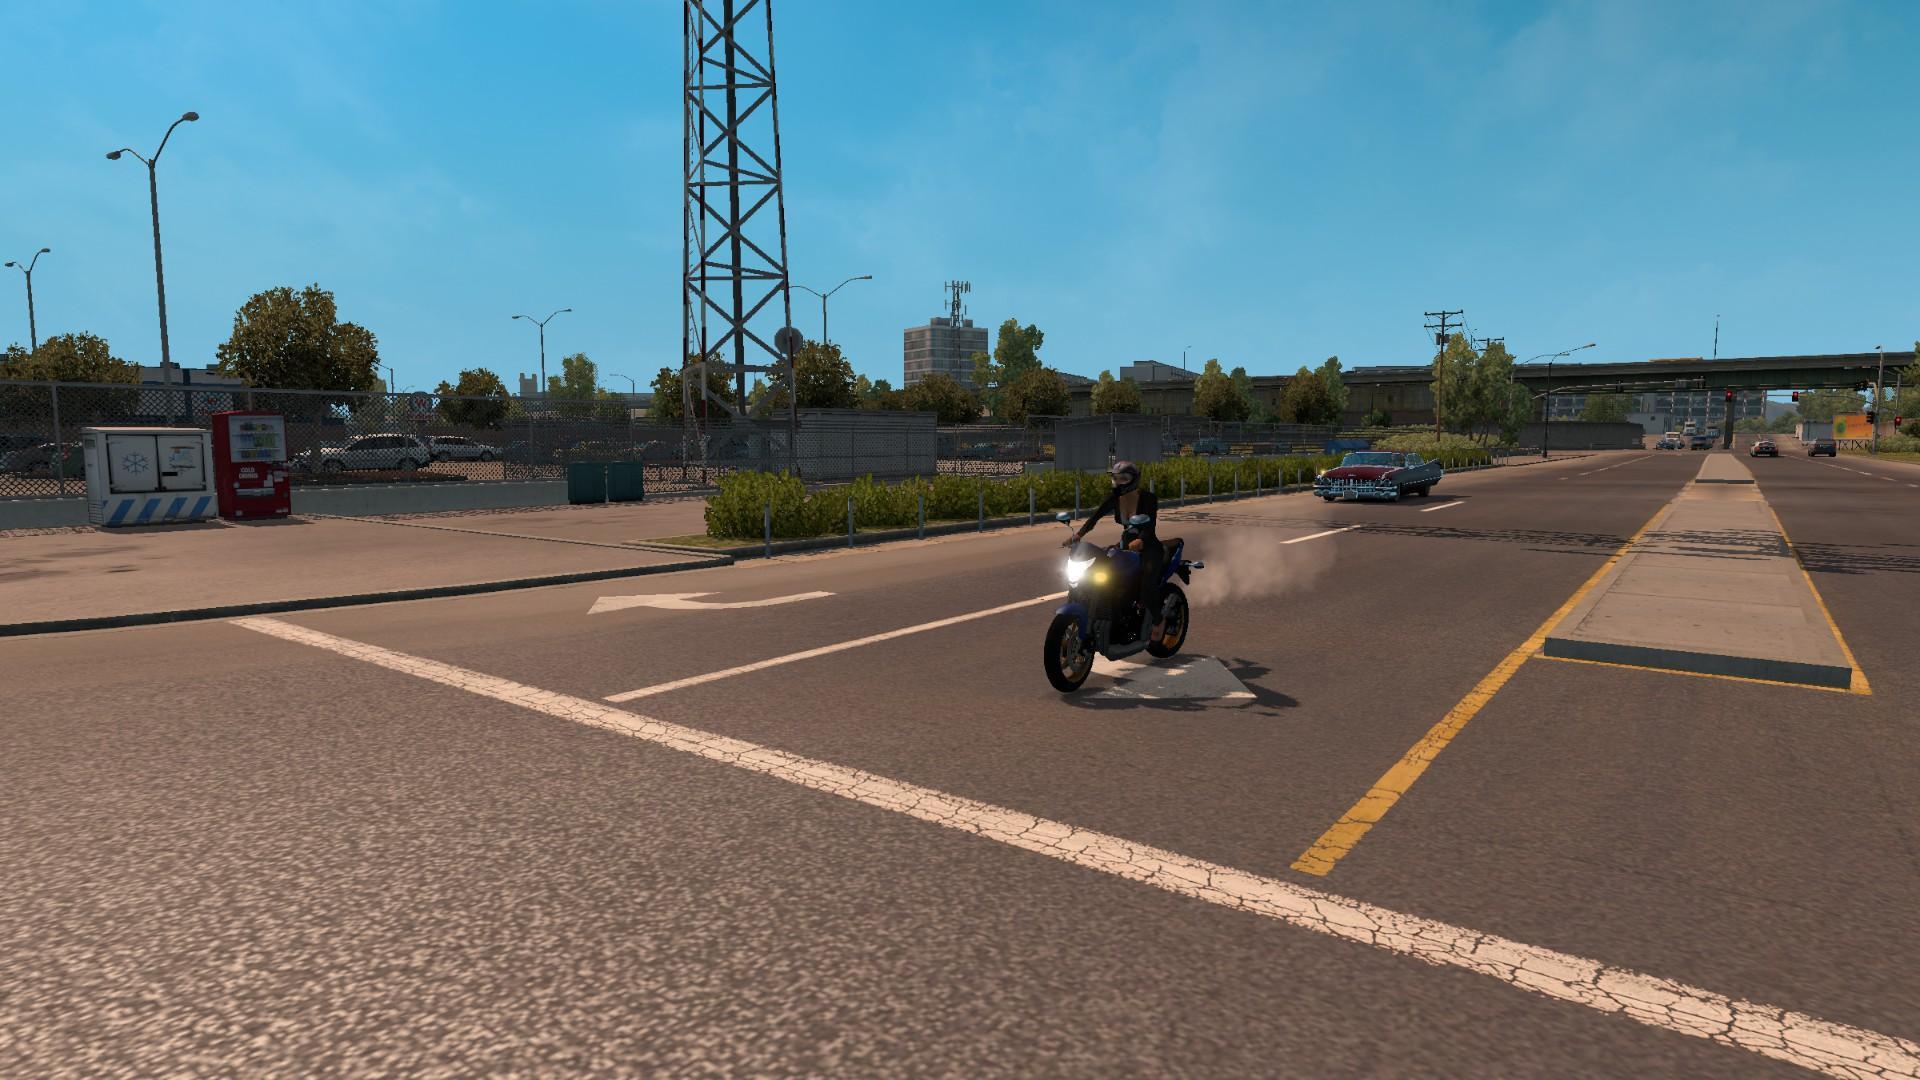 MOTORCYCLE-IN-TRAFFIC-V1.0.0-MOD-2.jpg